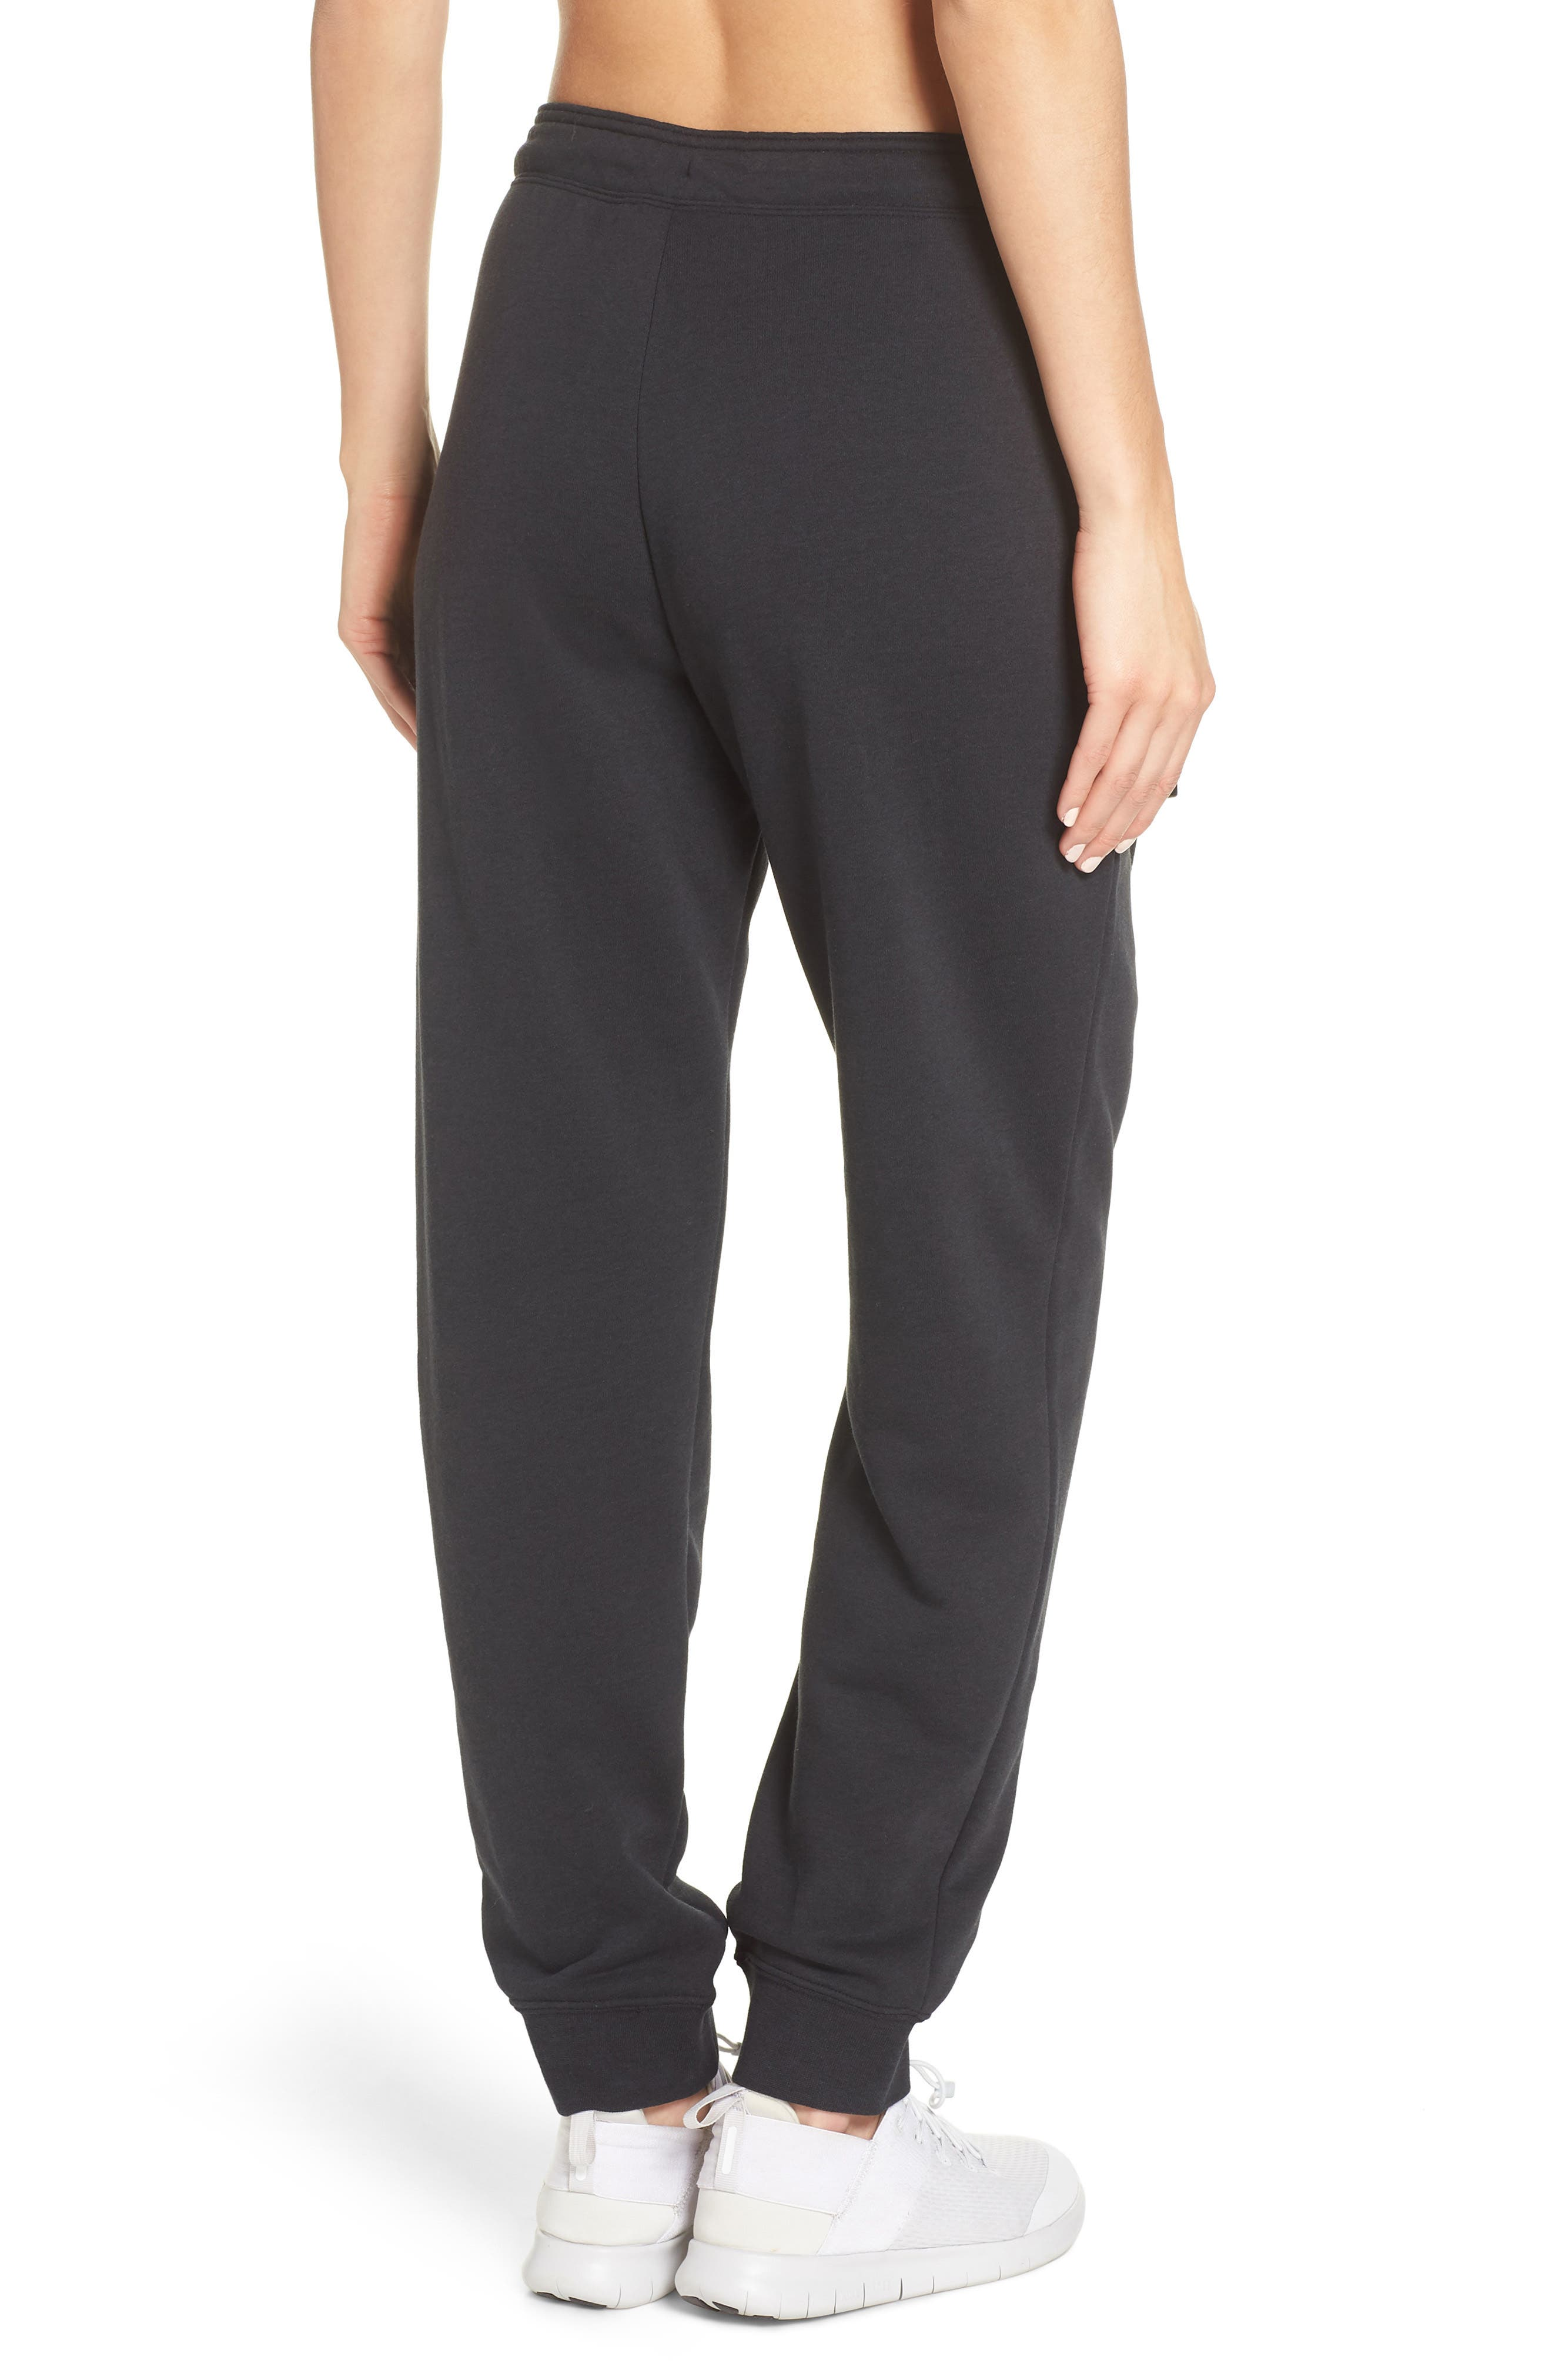 Sportswear Rally Jogger Pants,                             Alternate thumbnail 2, color,                             BLACK/ BLACK/ WHITE